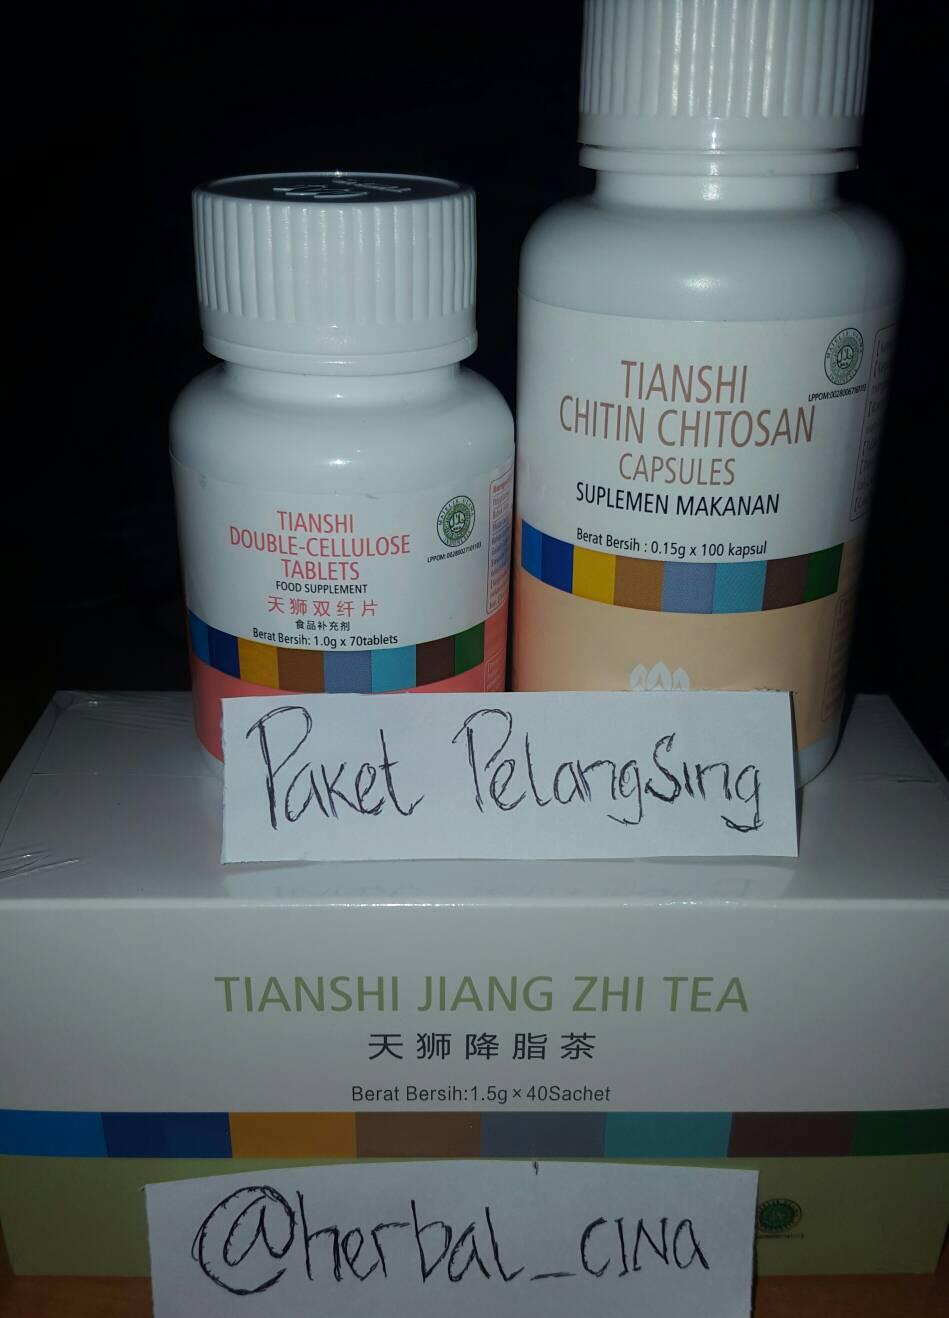 Jual Paket Pelangsing Premium Tiens Ig Herbal Cina Tokopedia Double Cellulose Tablets